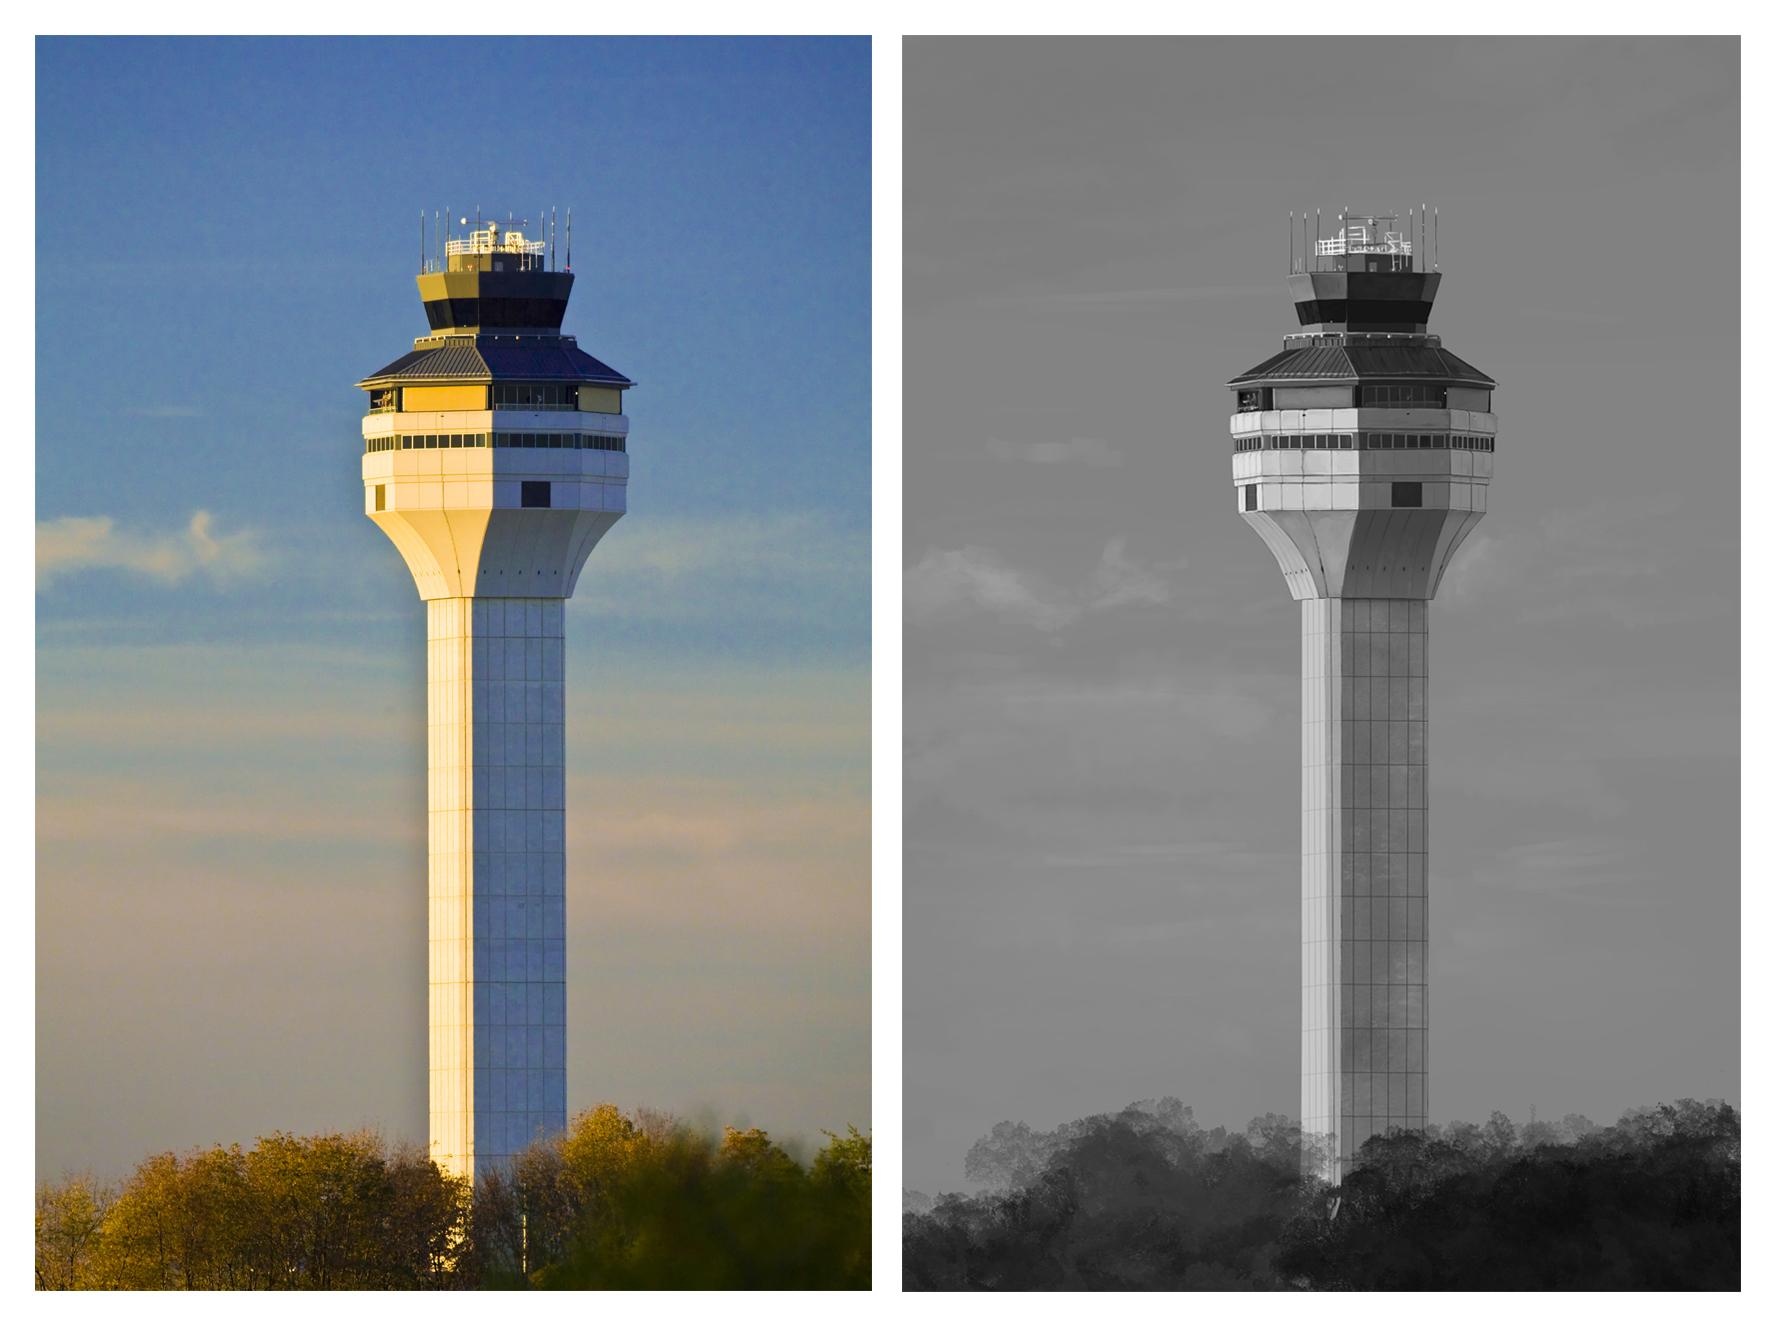 tower_comparison_by_namiiru-daon2ro.jpg